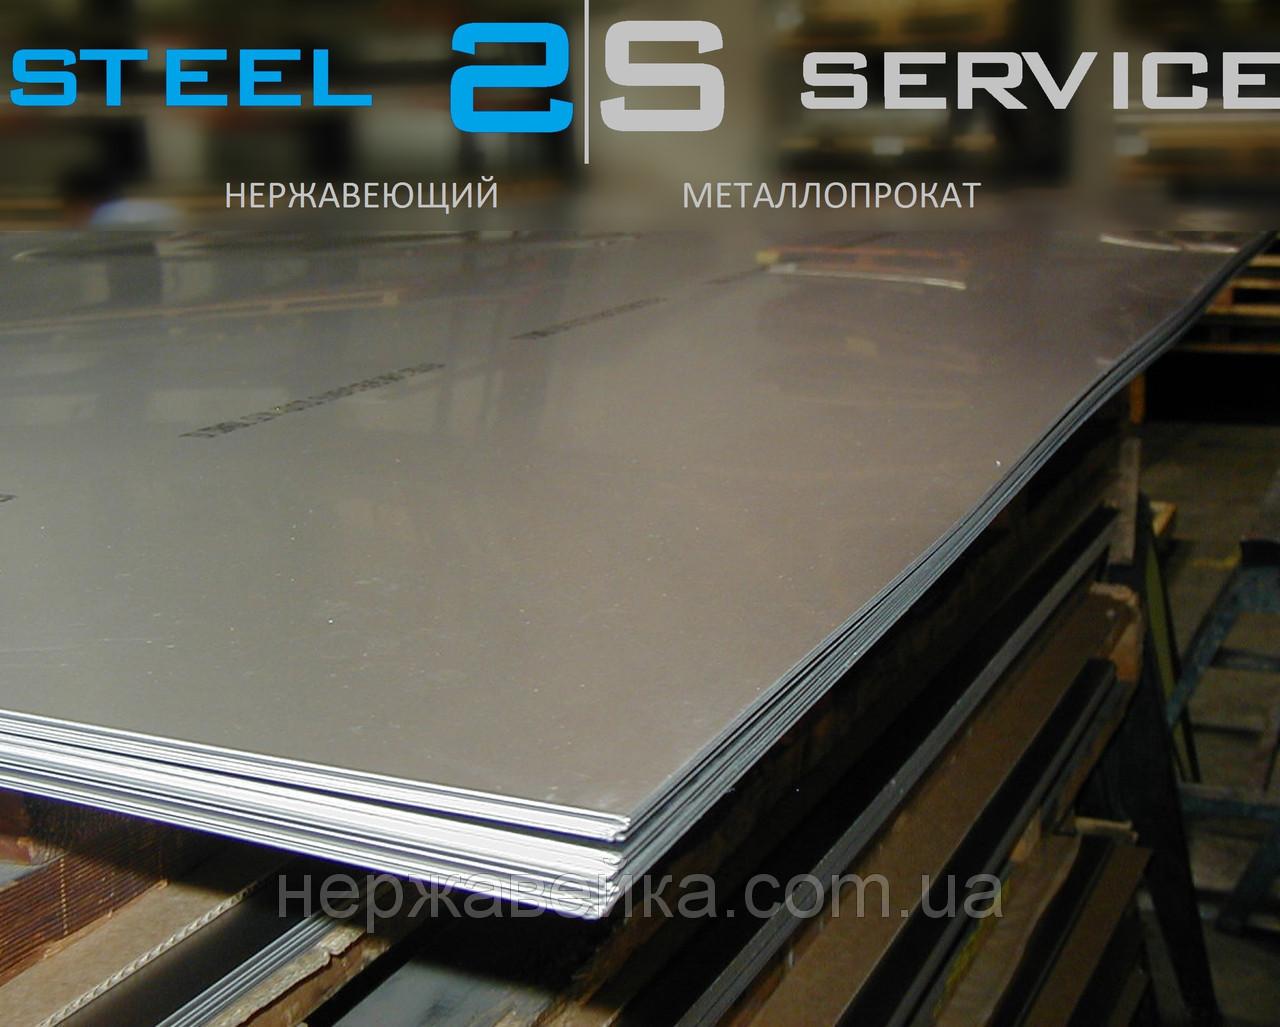 Листовая нержавейка 4х1500х6000мм  AISI 310(20Х23Н18) 2B - матовый,  жаропрочный